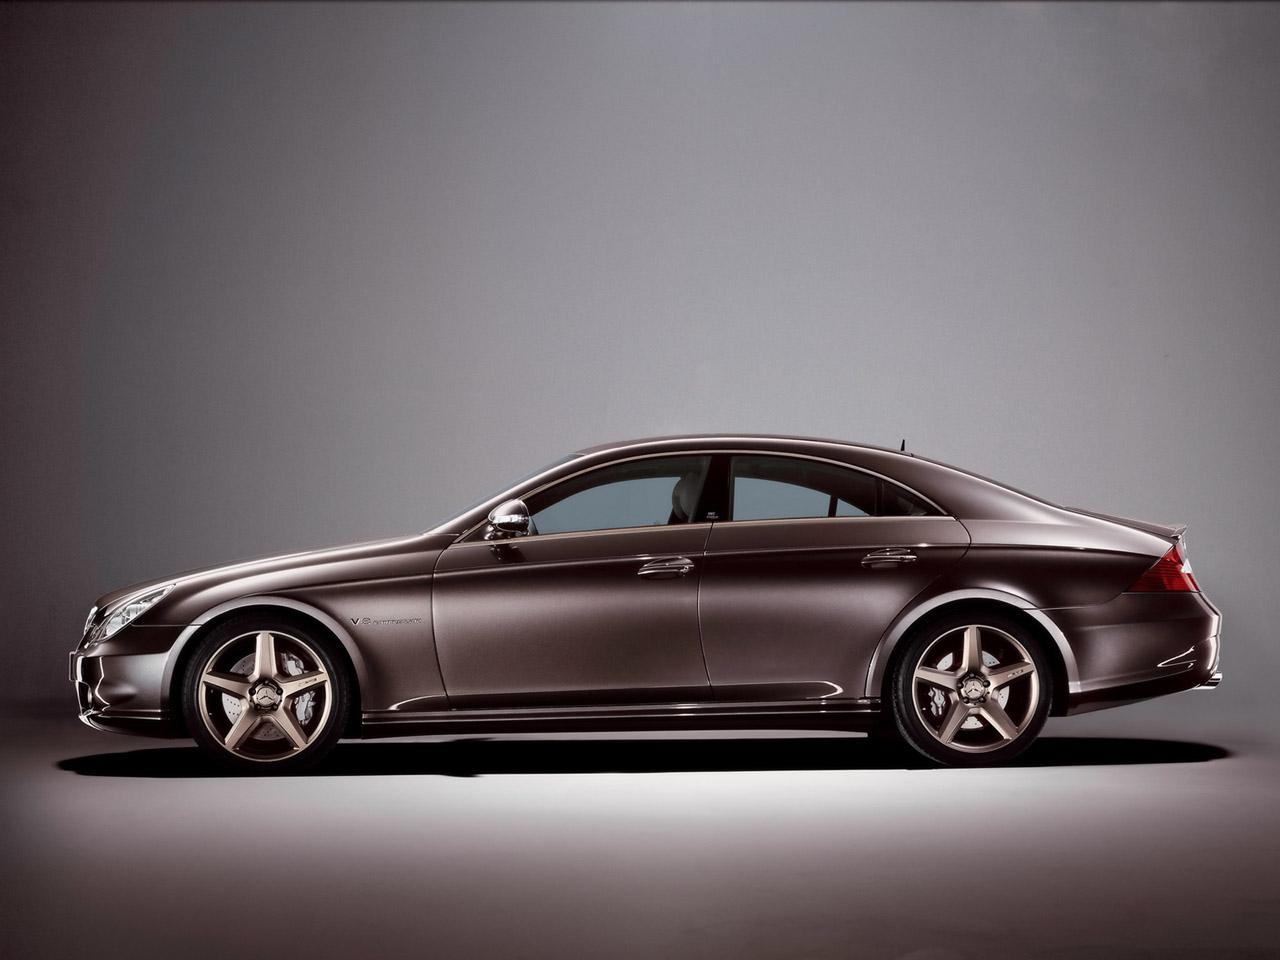 Mercedes benz cls55 amg for Mercedes benz cls55